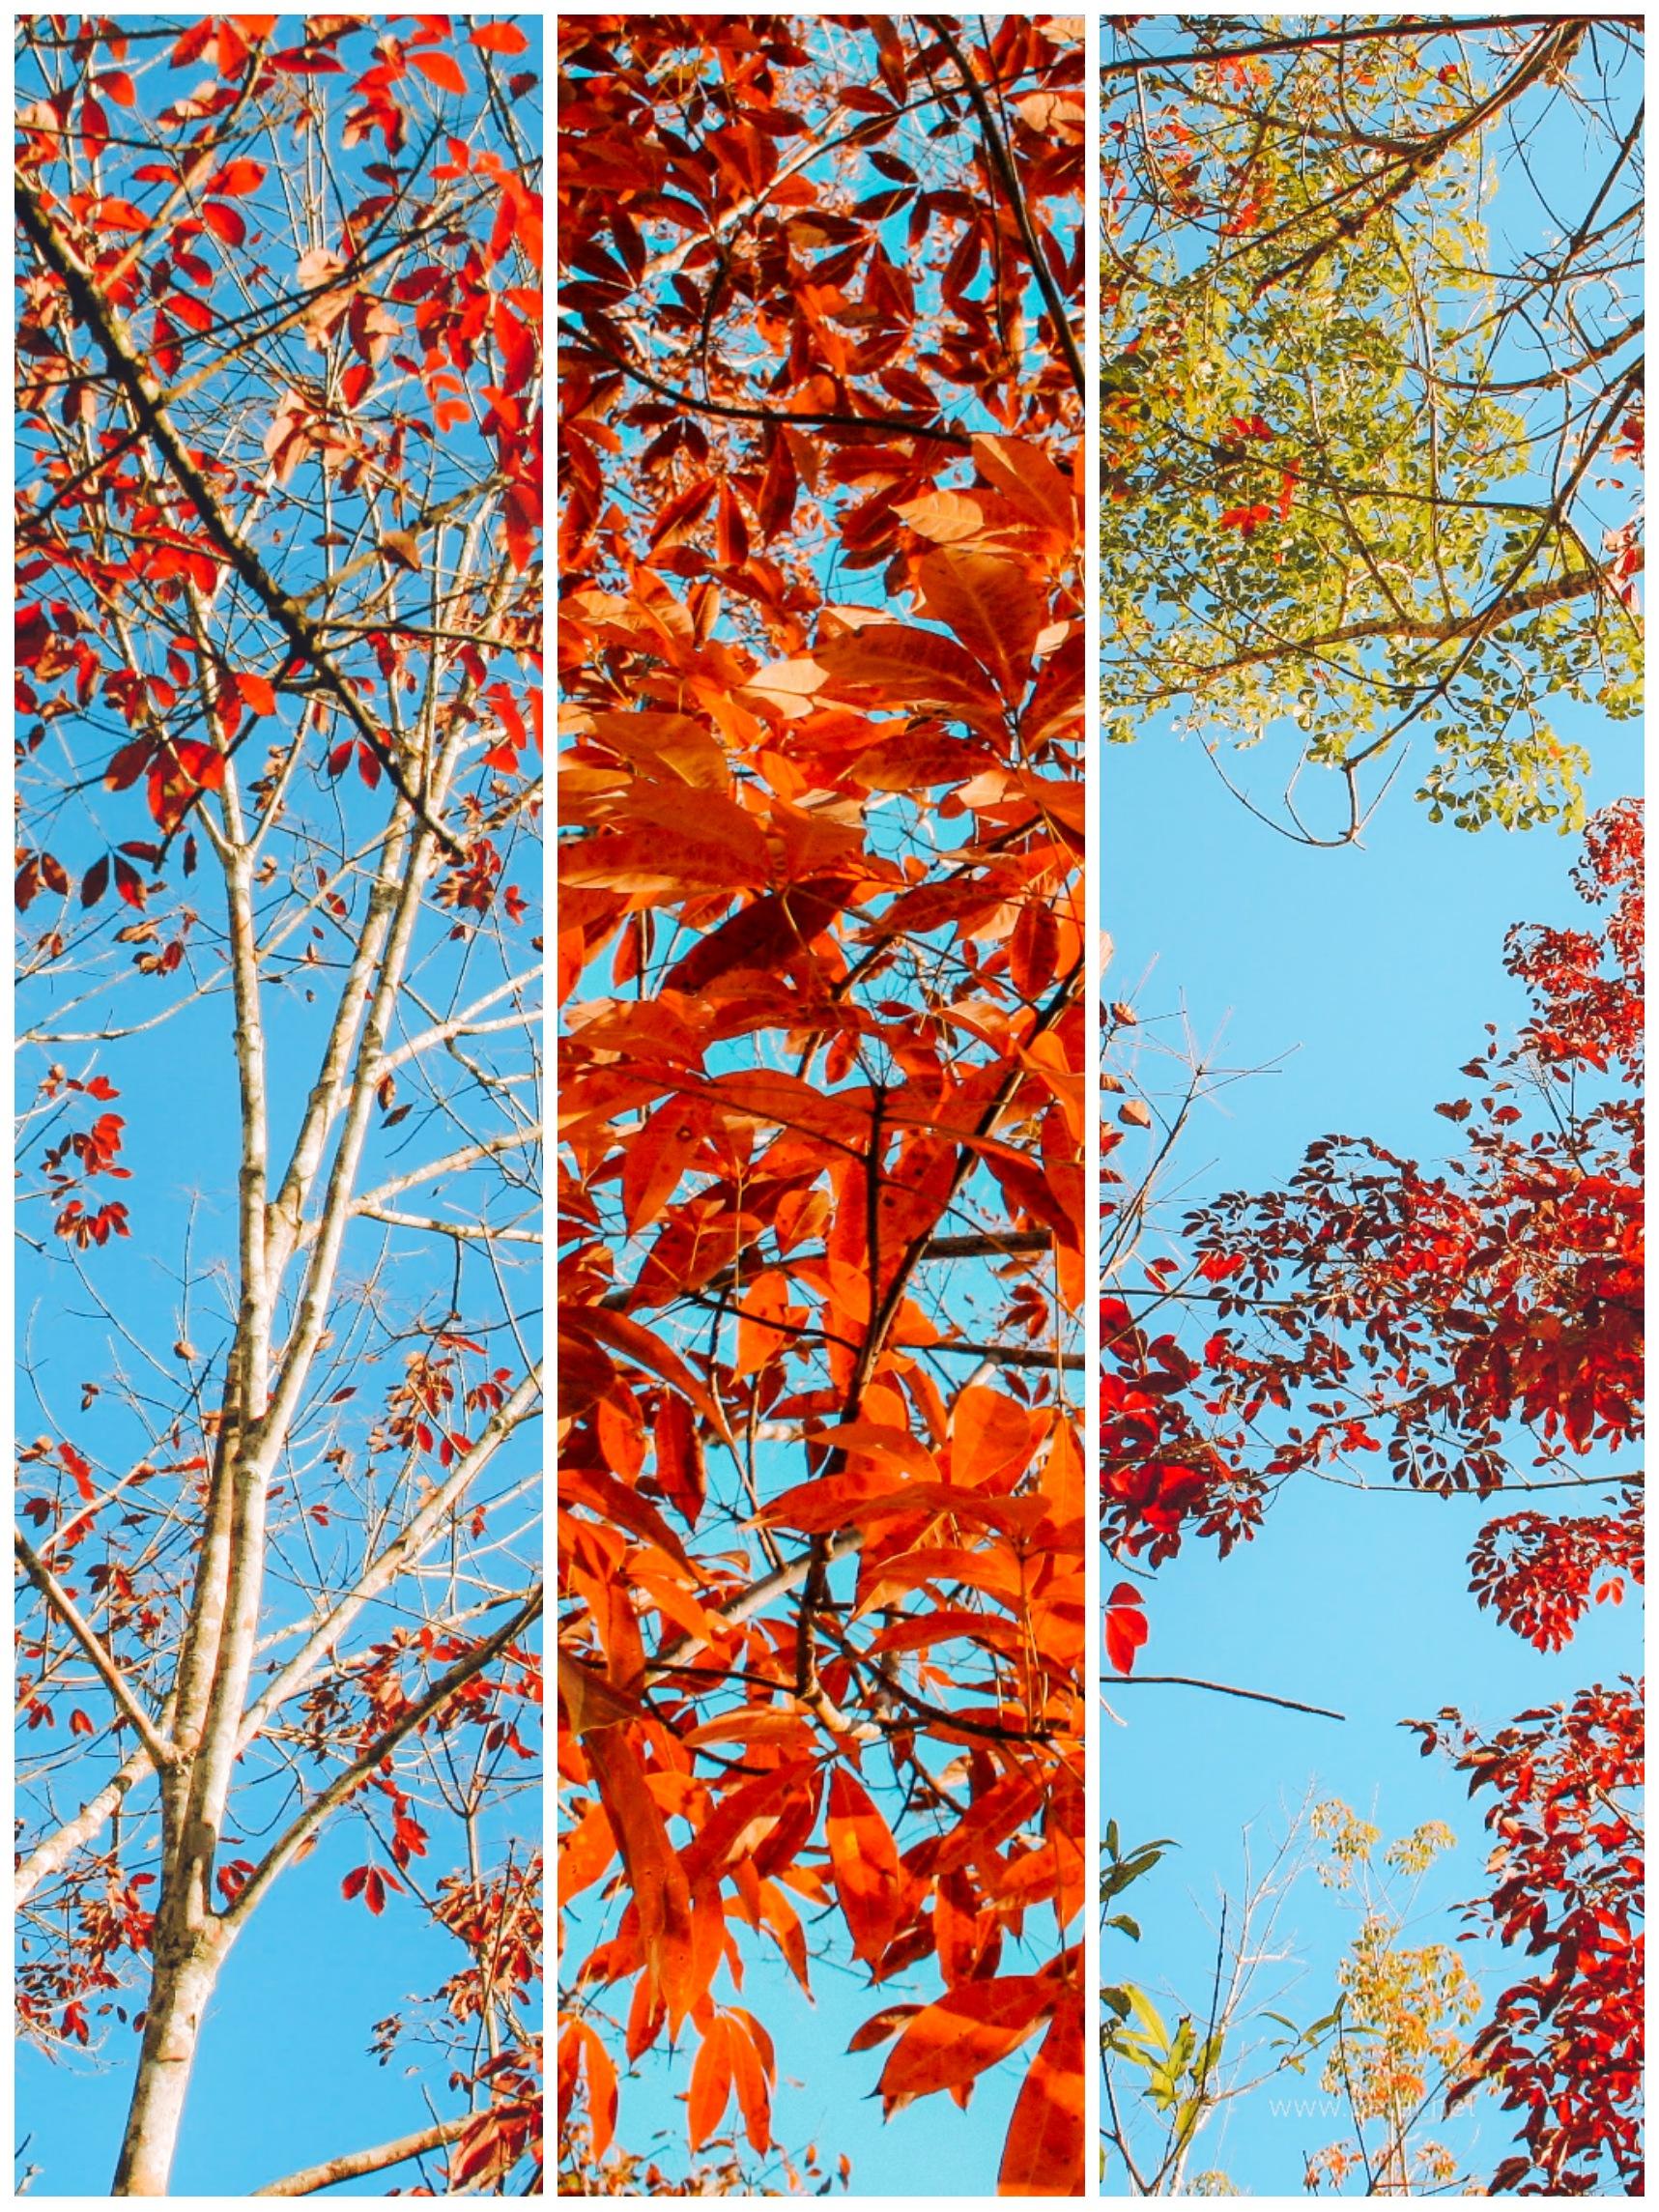 Cantiknya Pokok Getah Di Musim Luruh